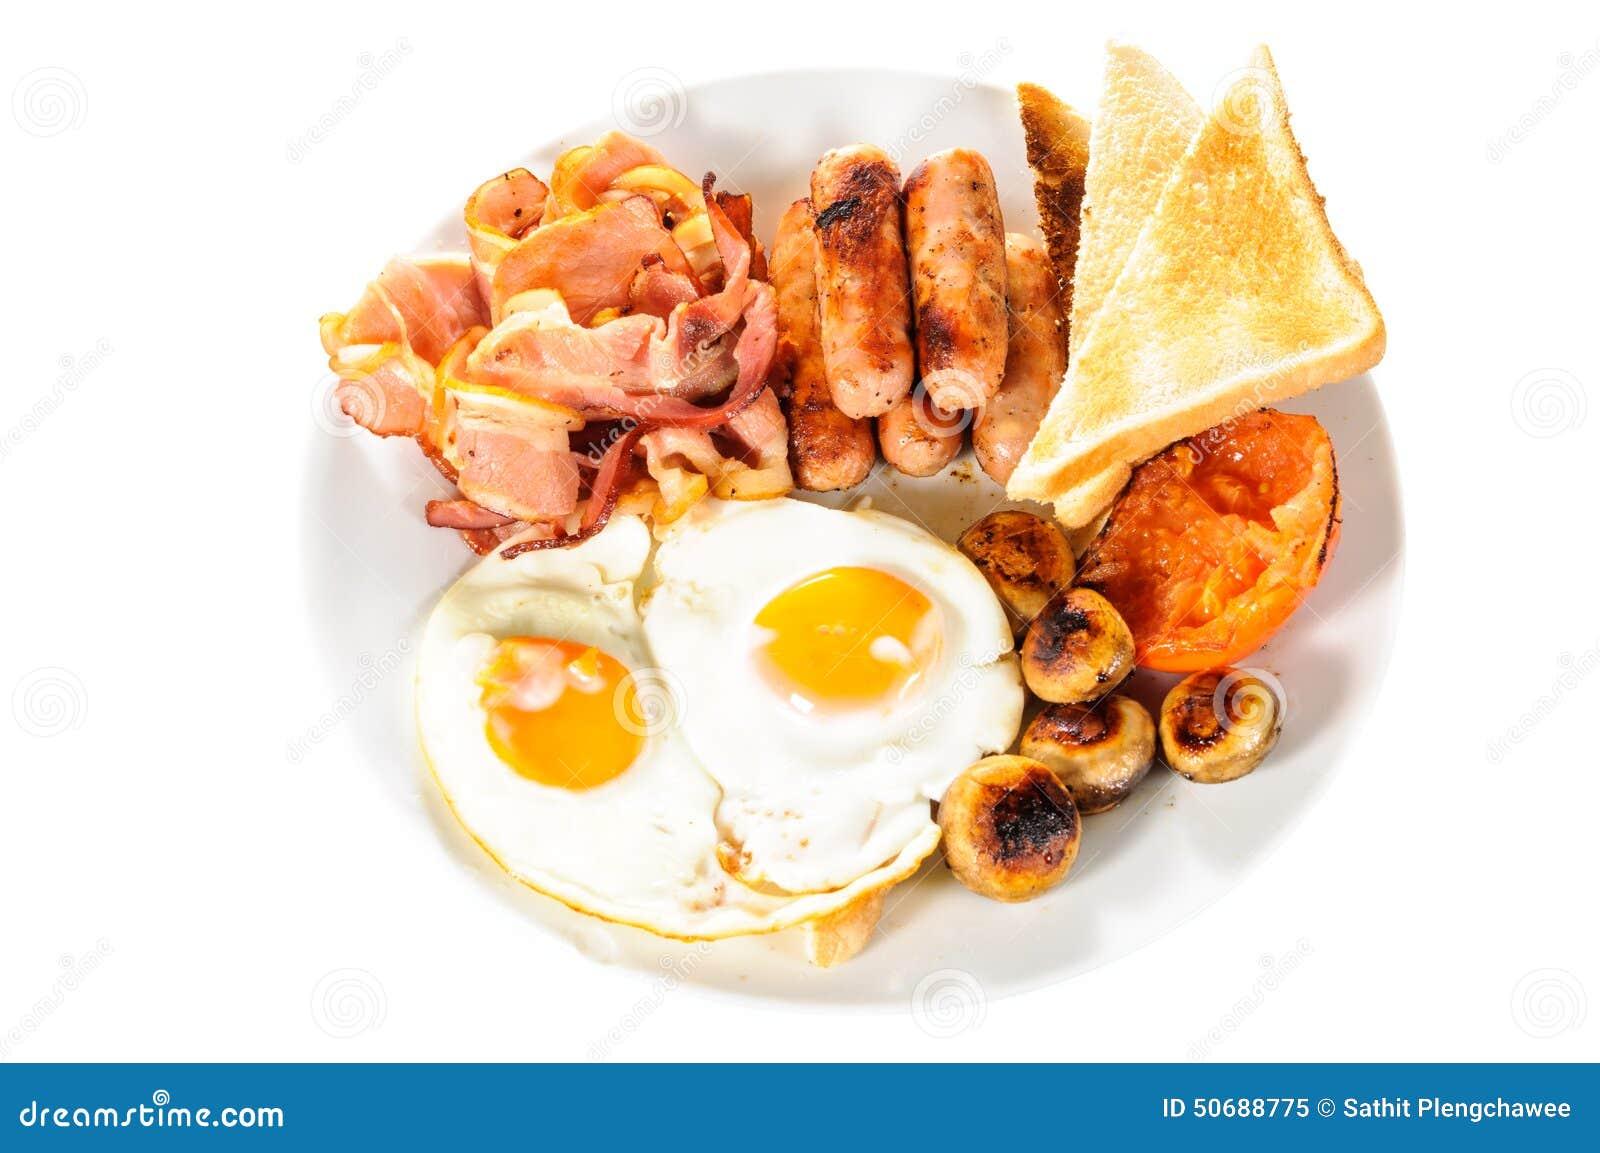 Download 英国大早餐 库存图片. 图片 包括有 查出, 细菌学, 多士, 烹调, 空白, 油炸物, 牌照, browne - 50688775